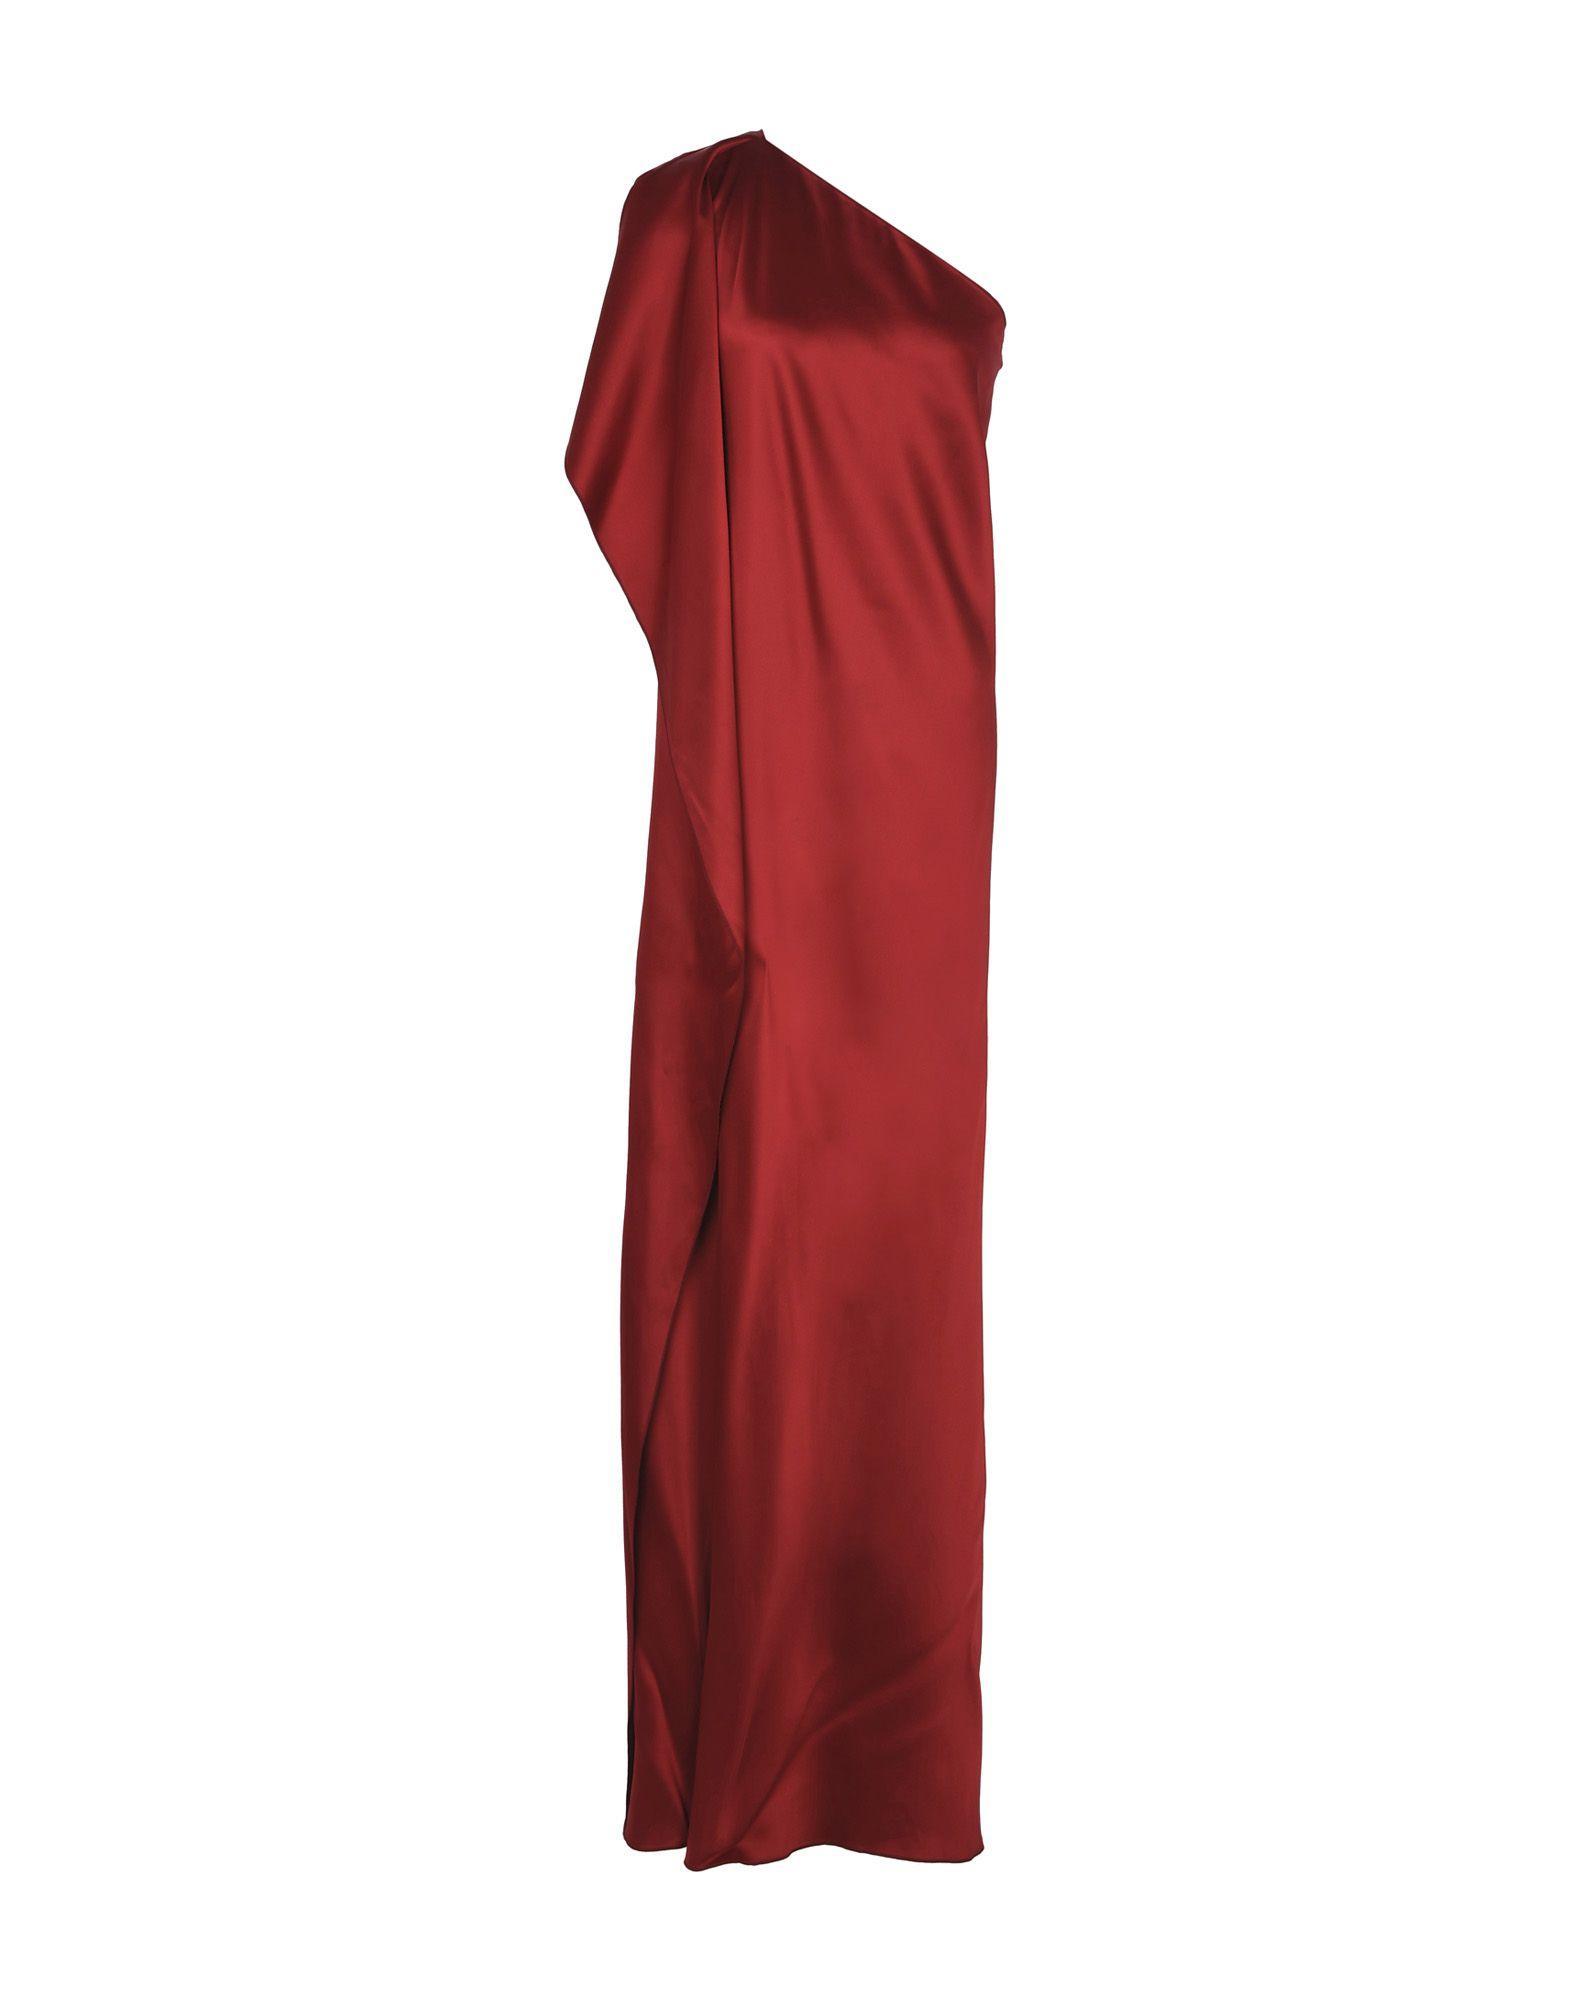 Maison Rabih Kayrouz Long Dress In Maroon